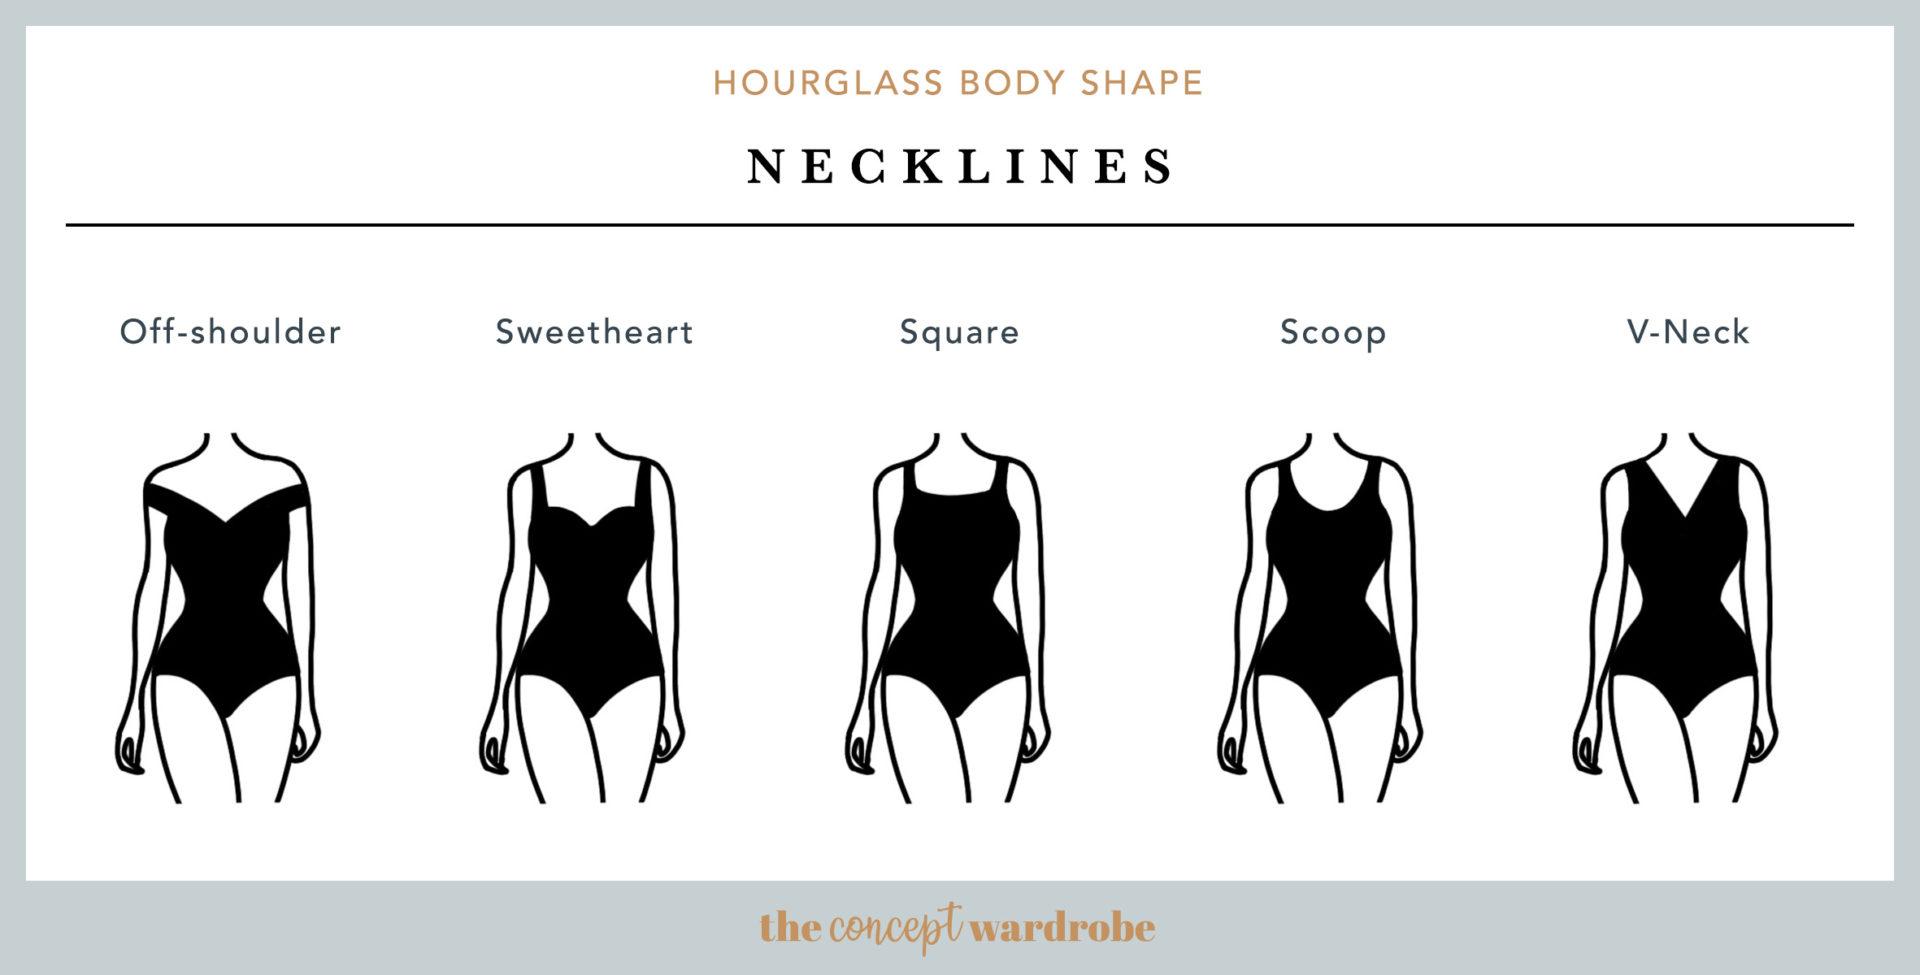 Hourglass Body Shape Necklines - the concept wardrobe